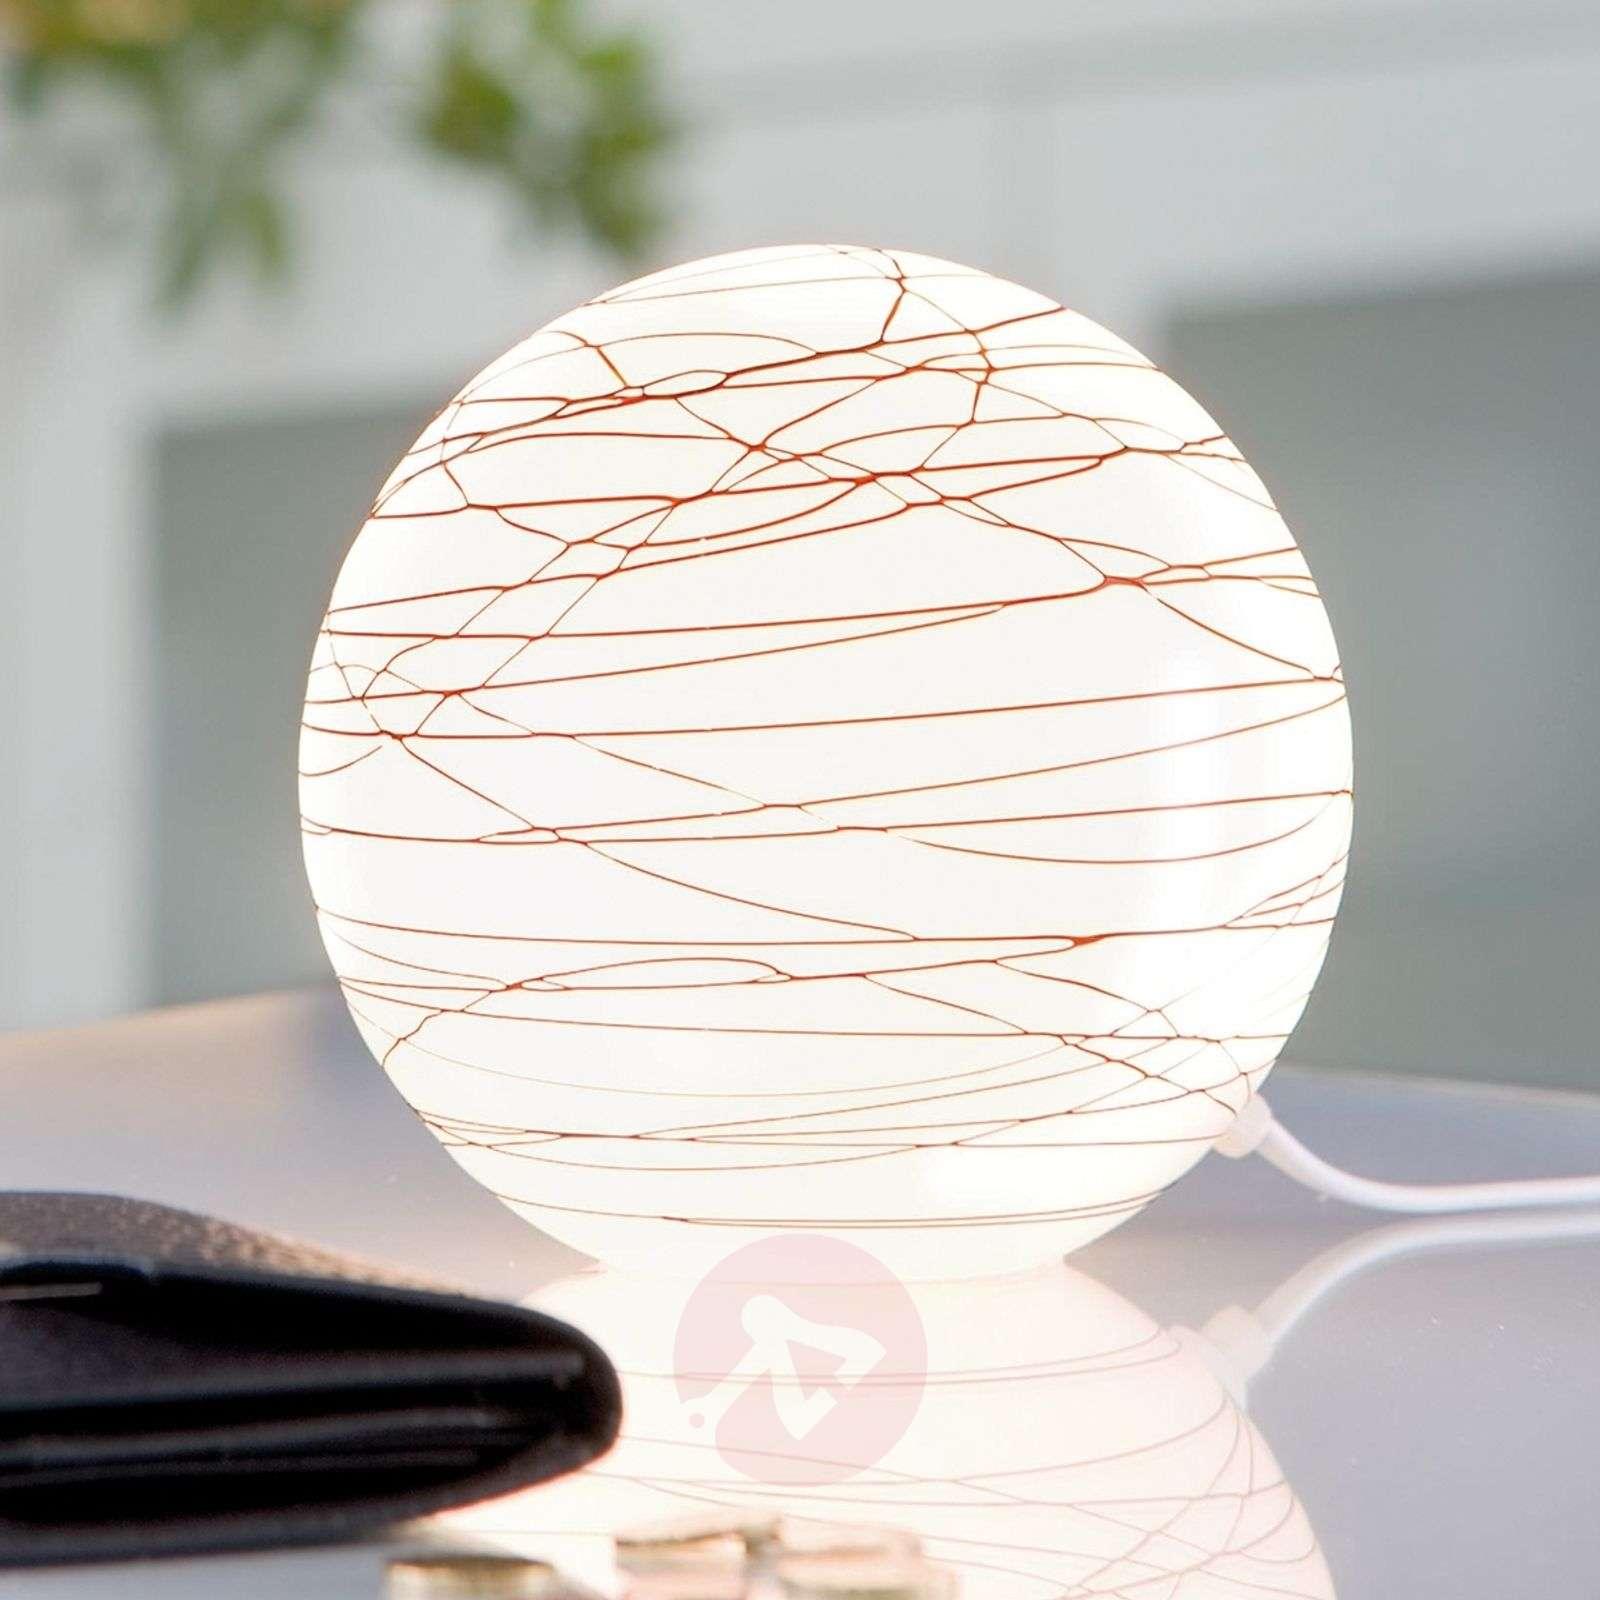 Paulmann Giba table lamp made of glass-7500735-01